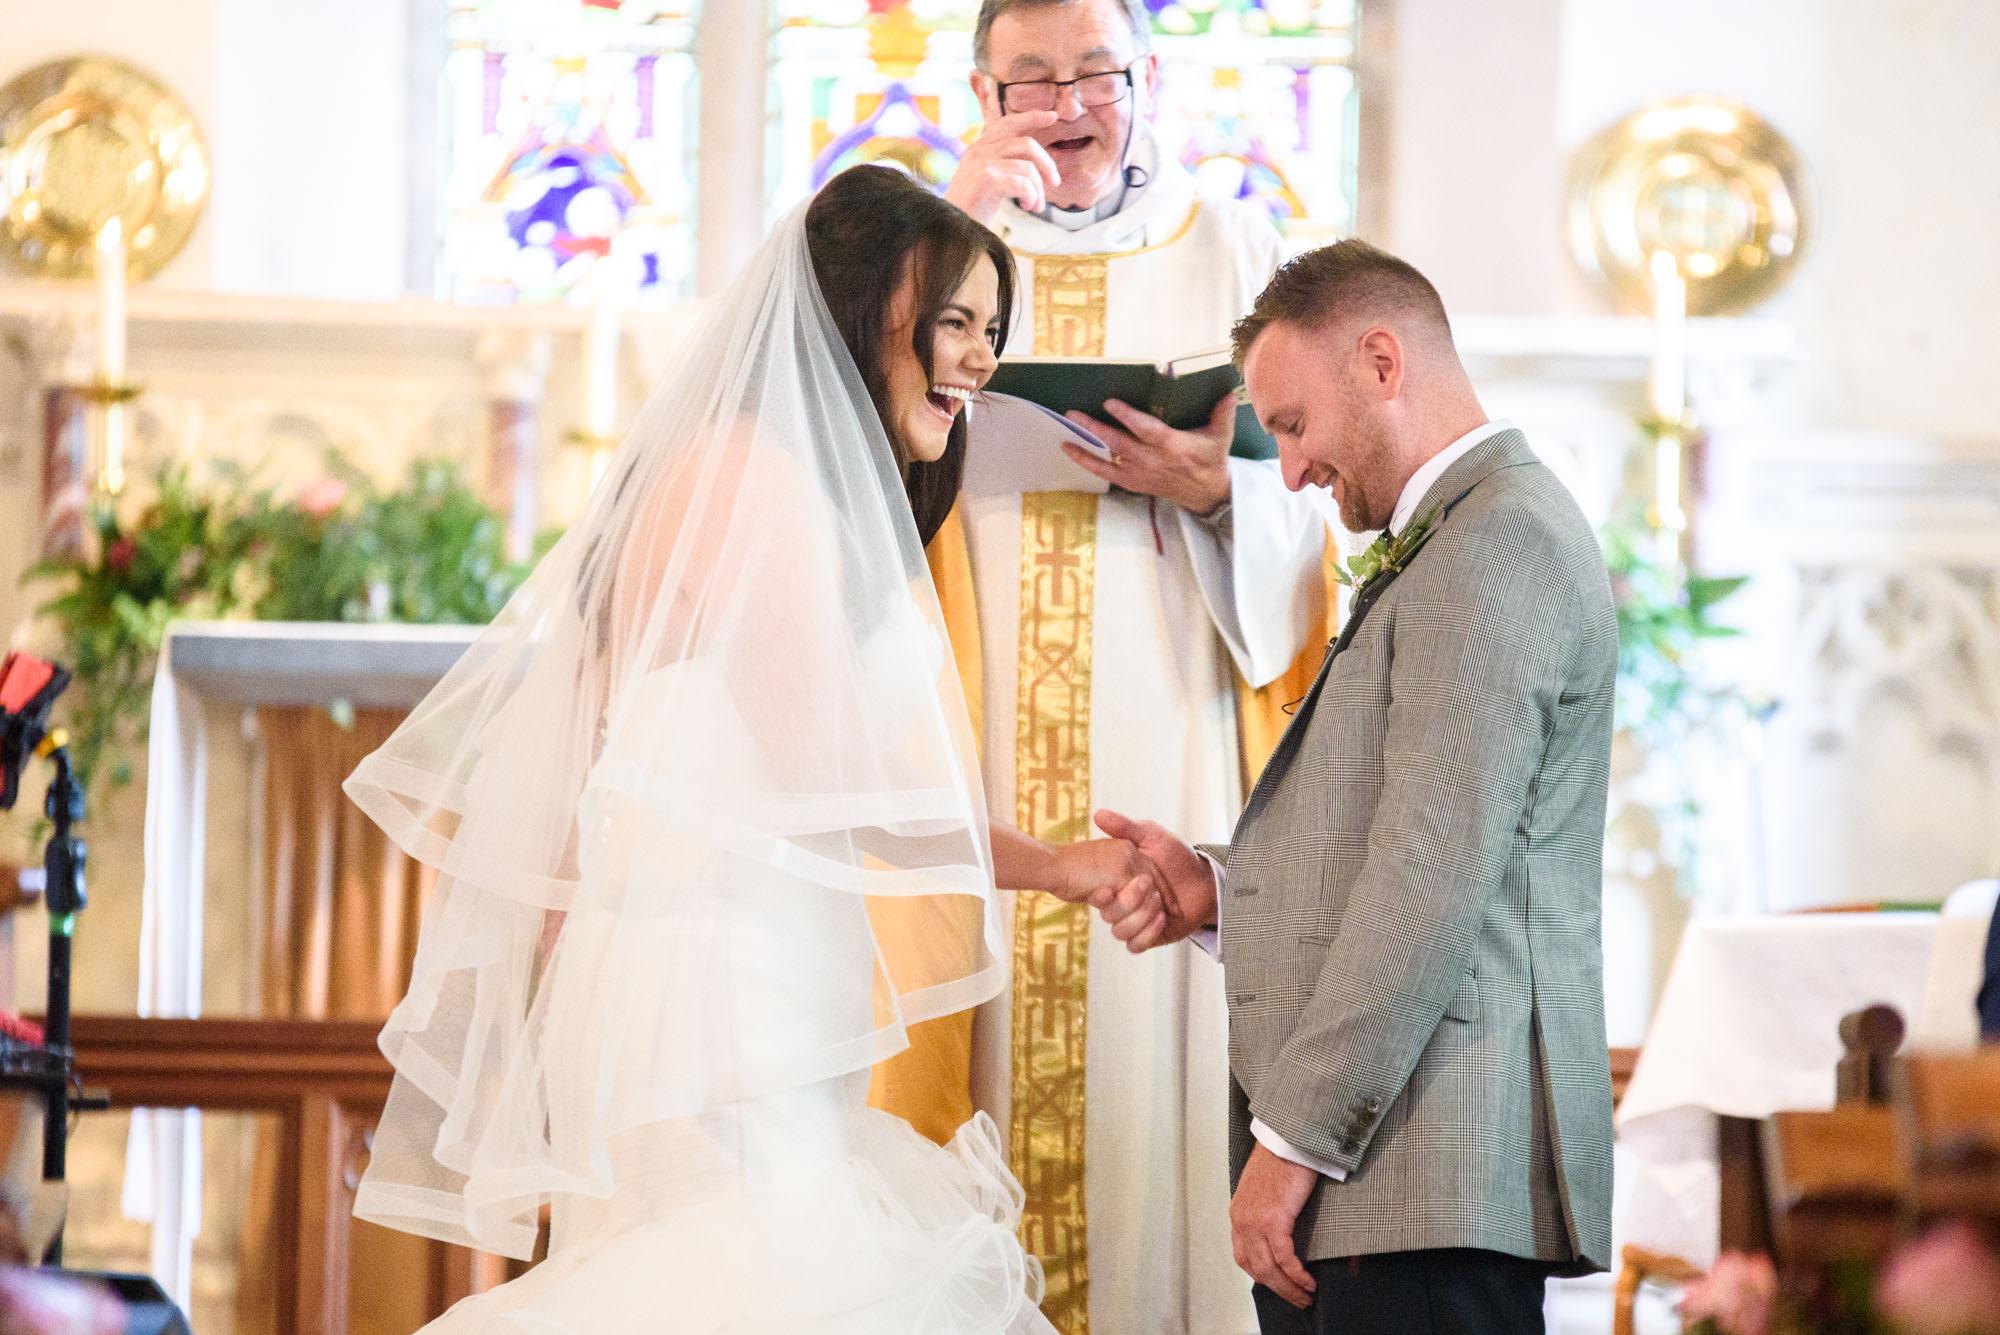 wedding ceremony at st mary's church in Llanfairpwllgwyngyll